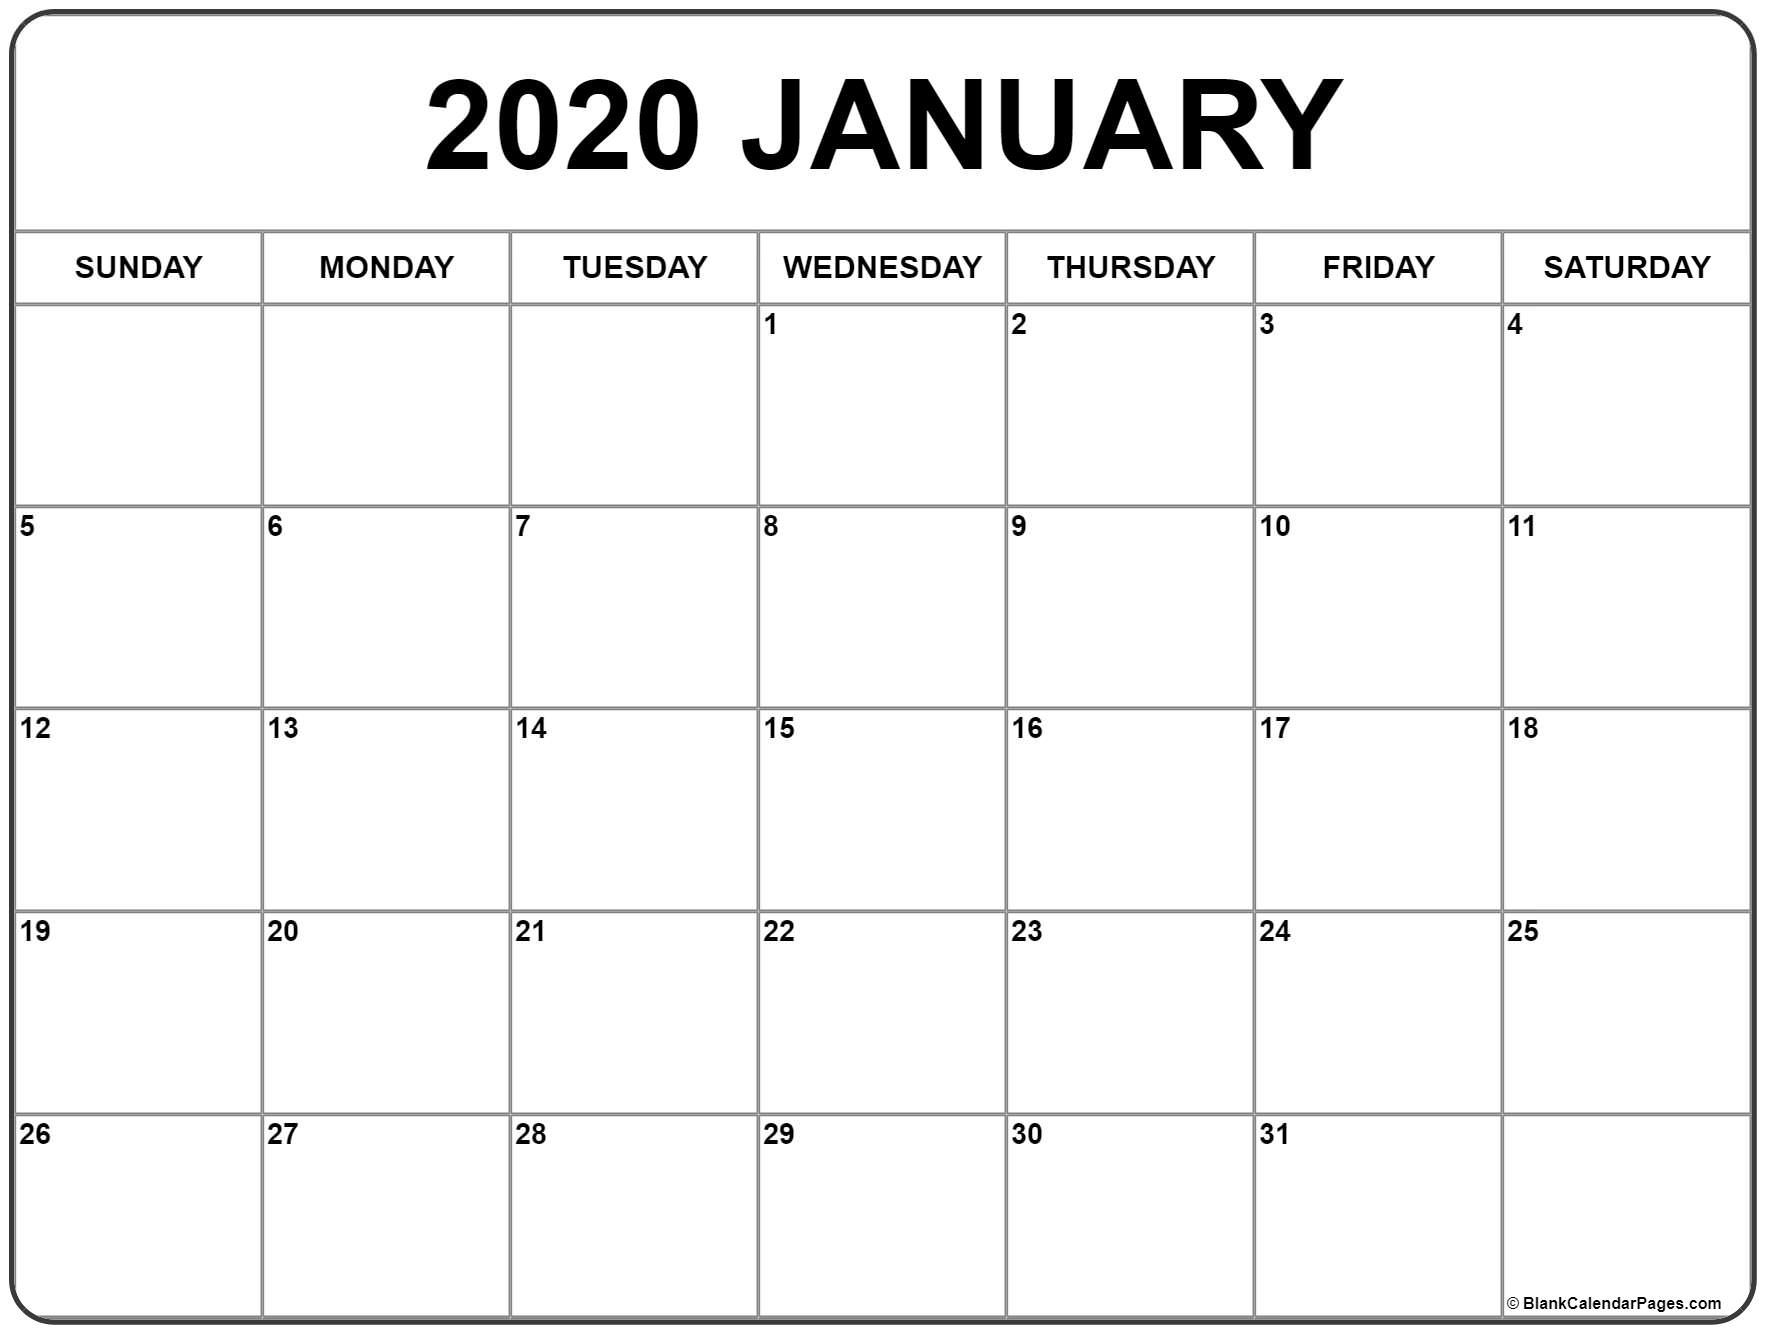 January 2020 Calendar | Free Printable Monthly Calendars regarding Blank January Calendar 2020